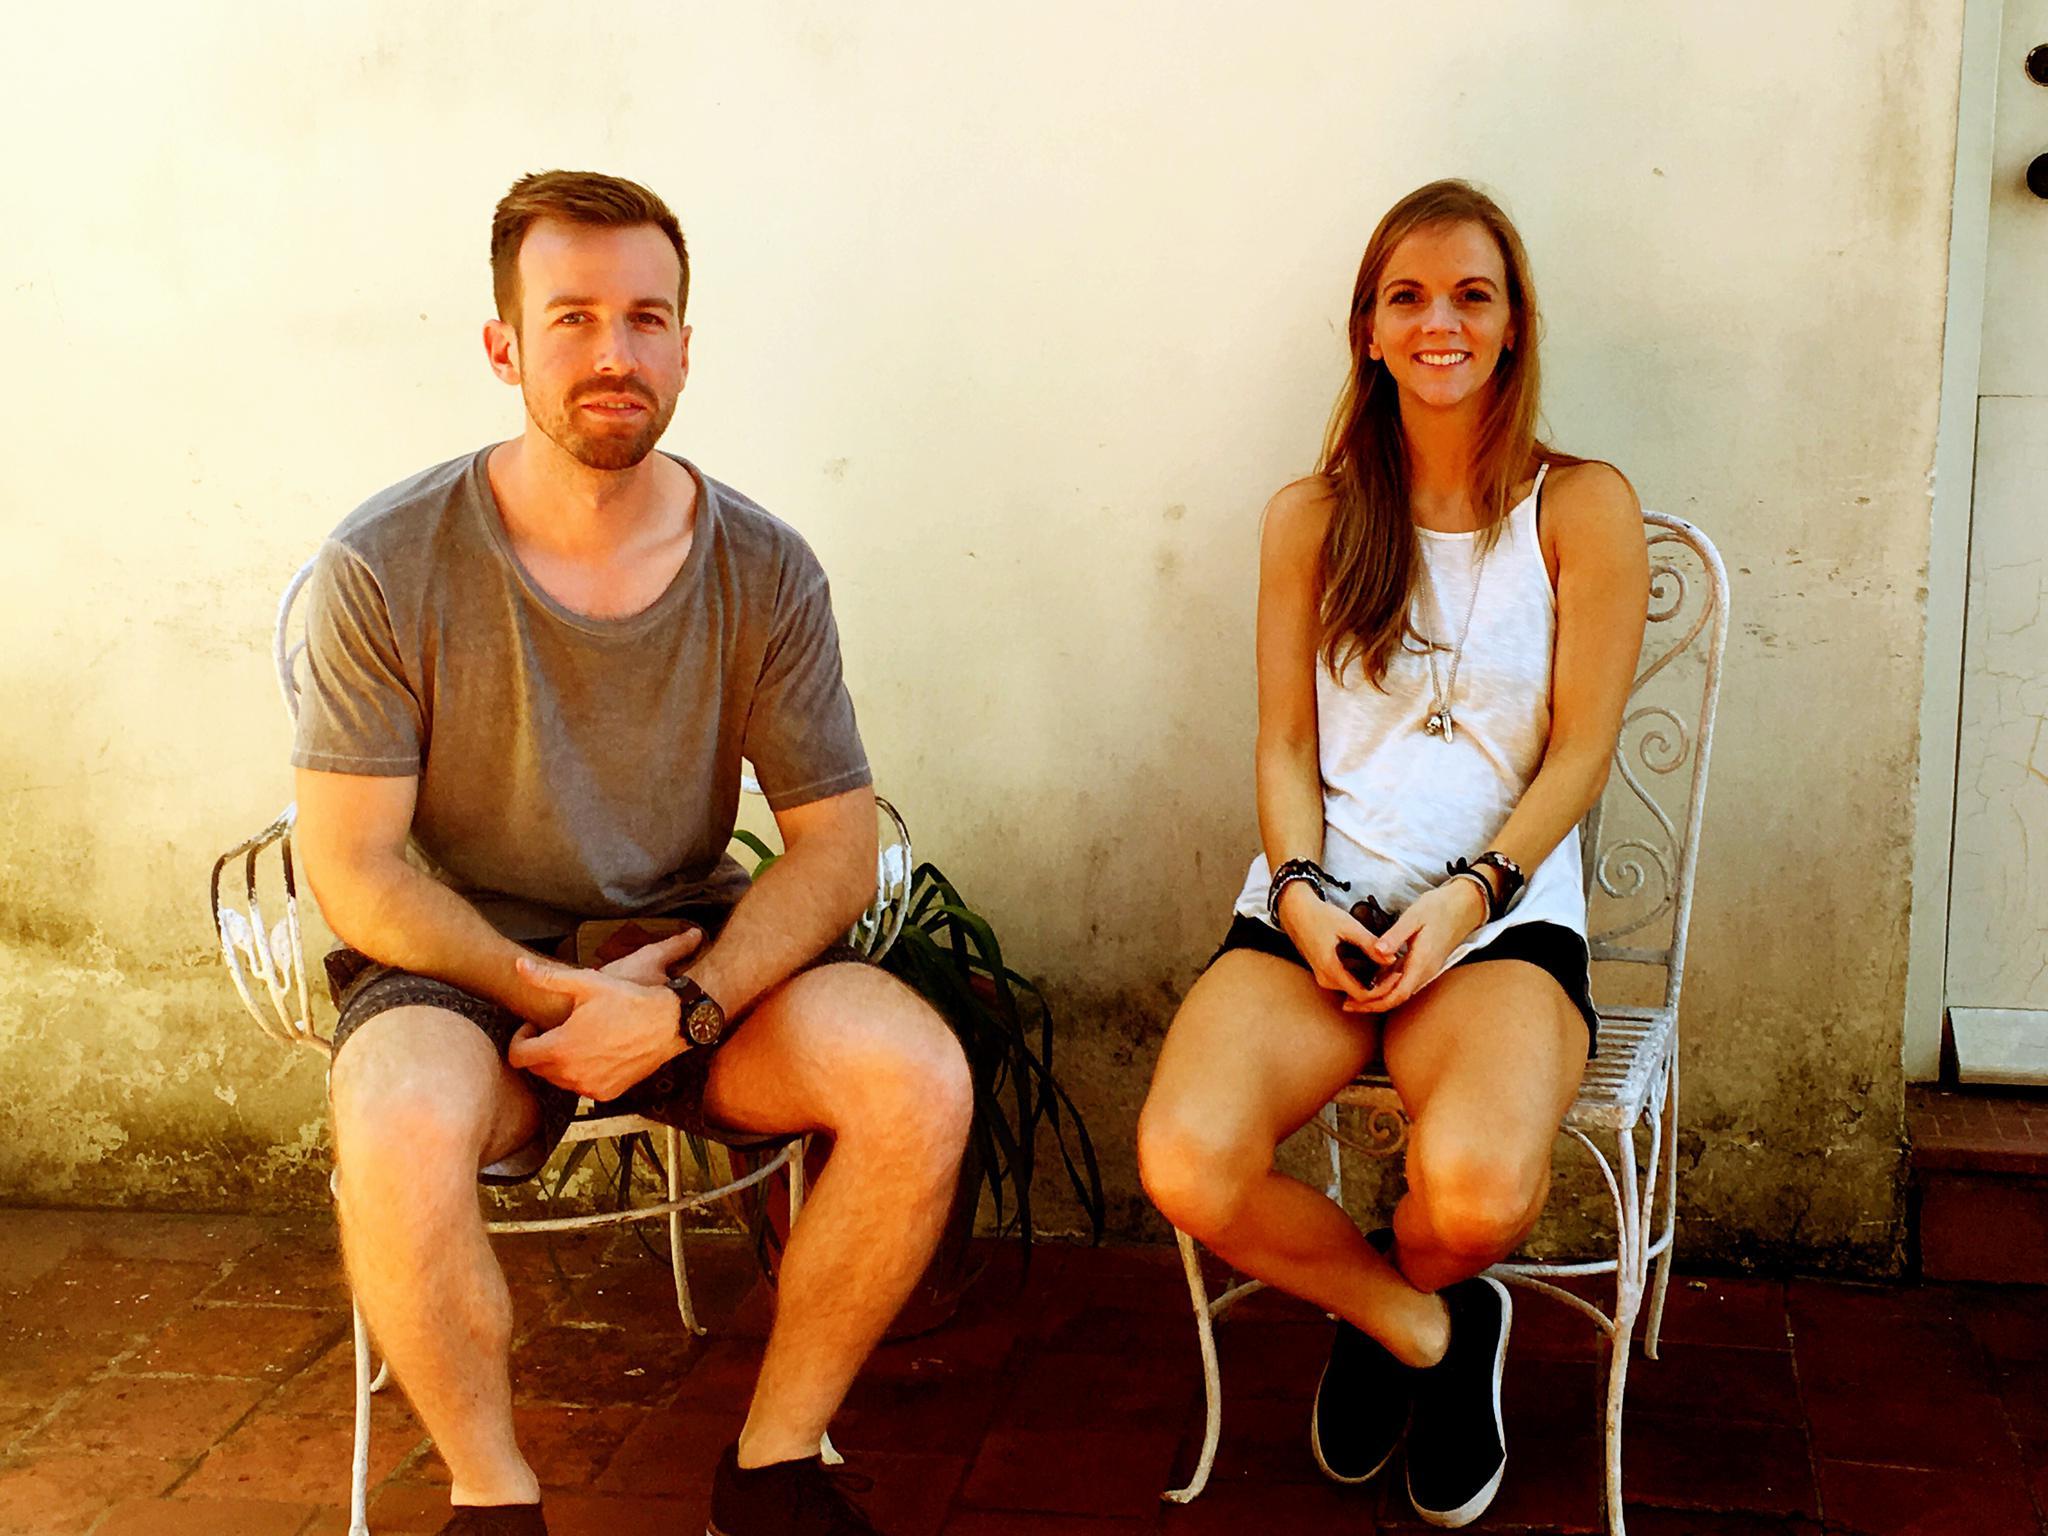 Ernest Hemingway's home in Cuba